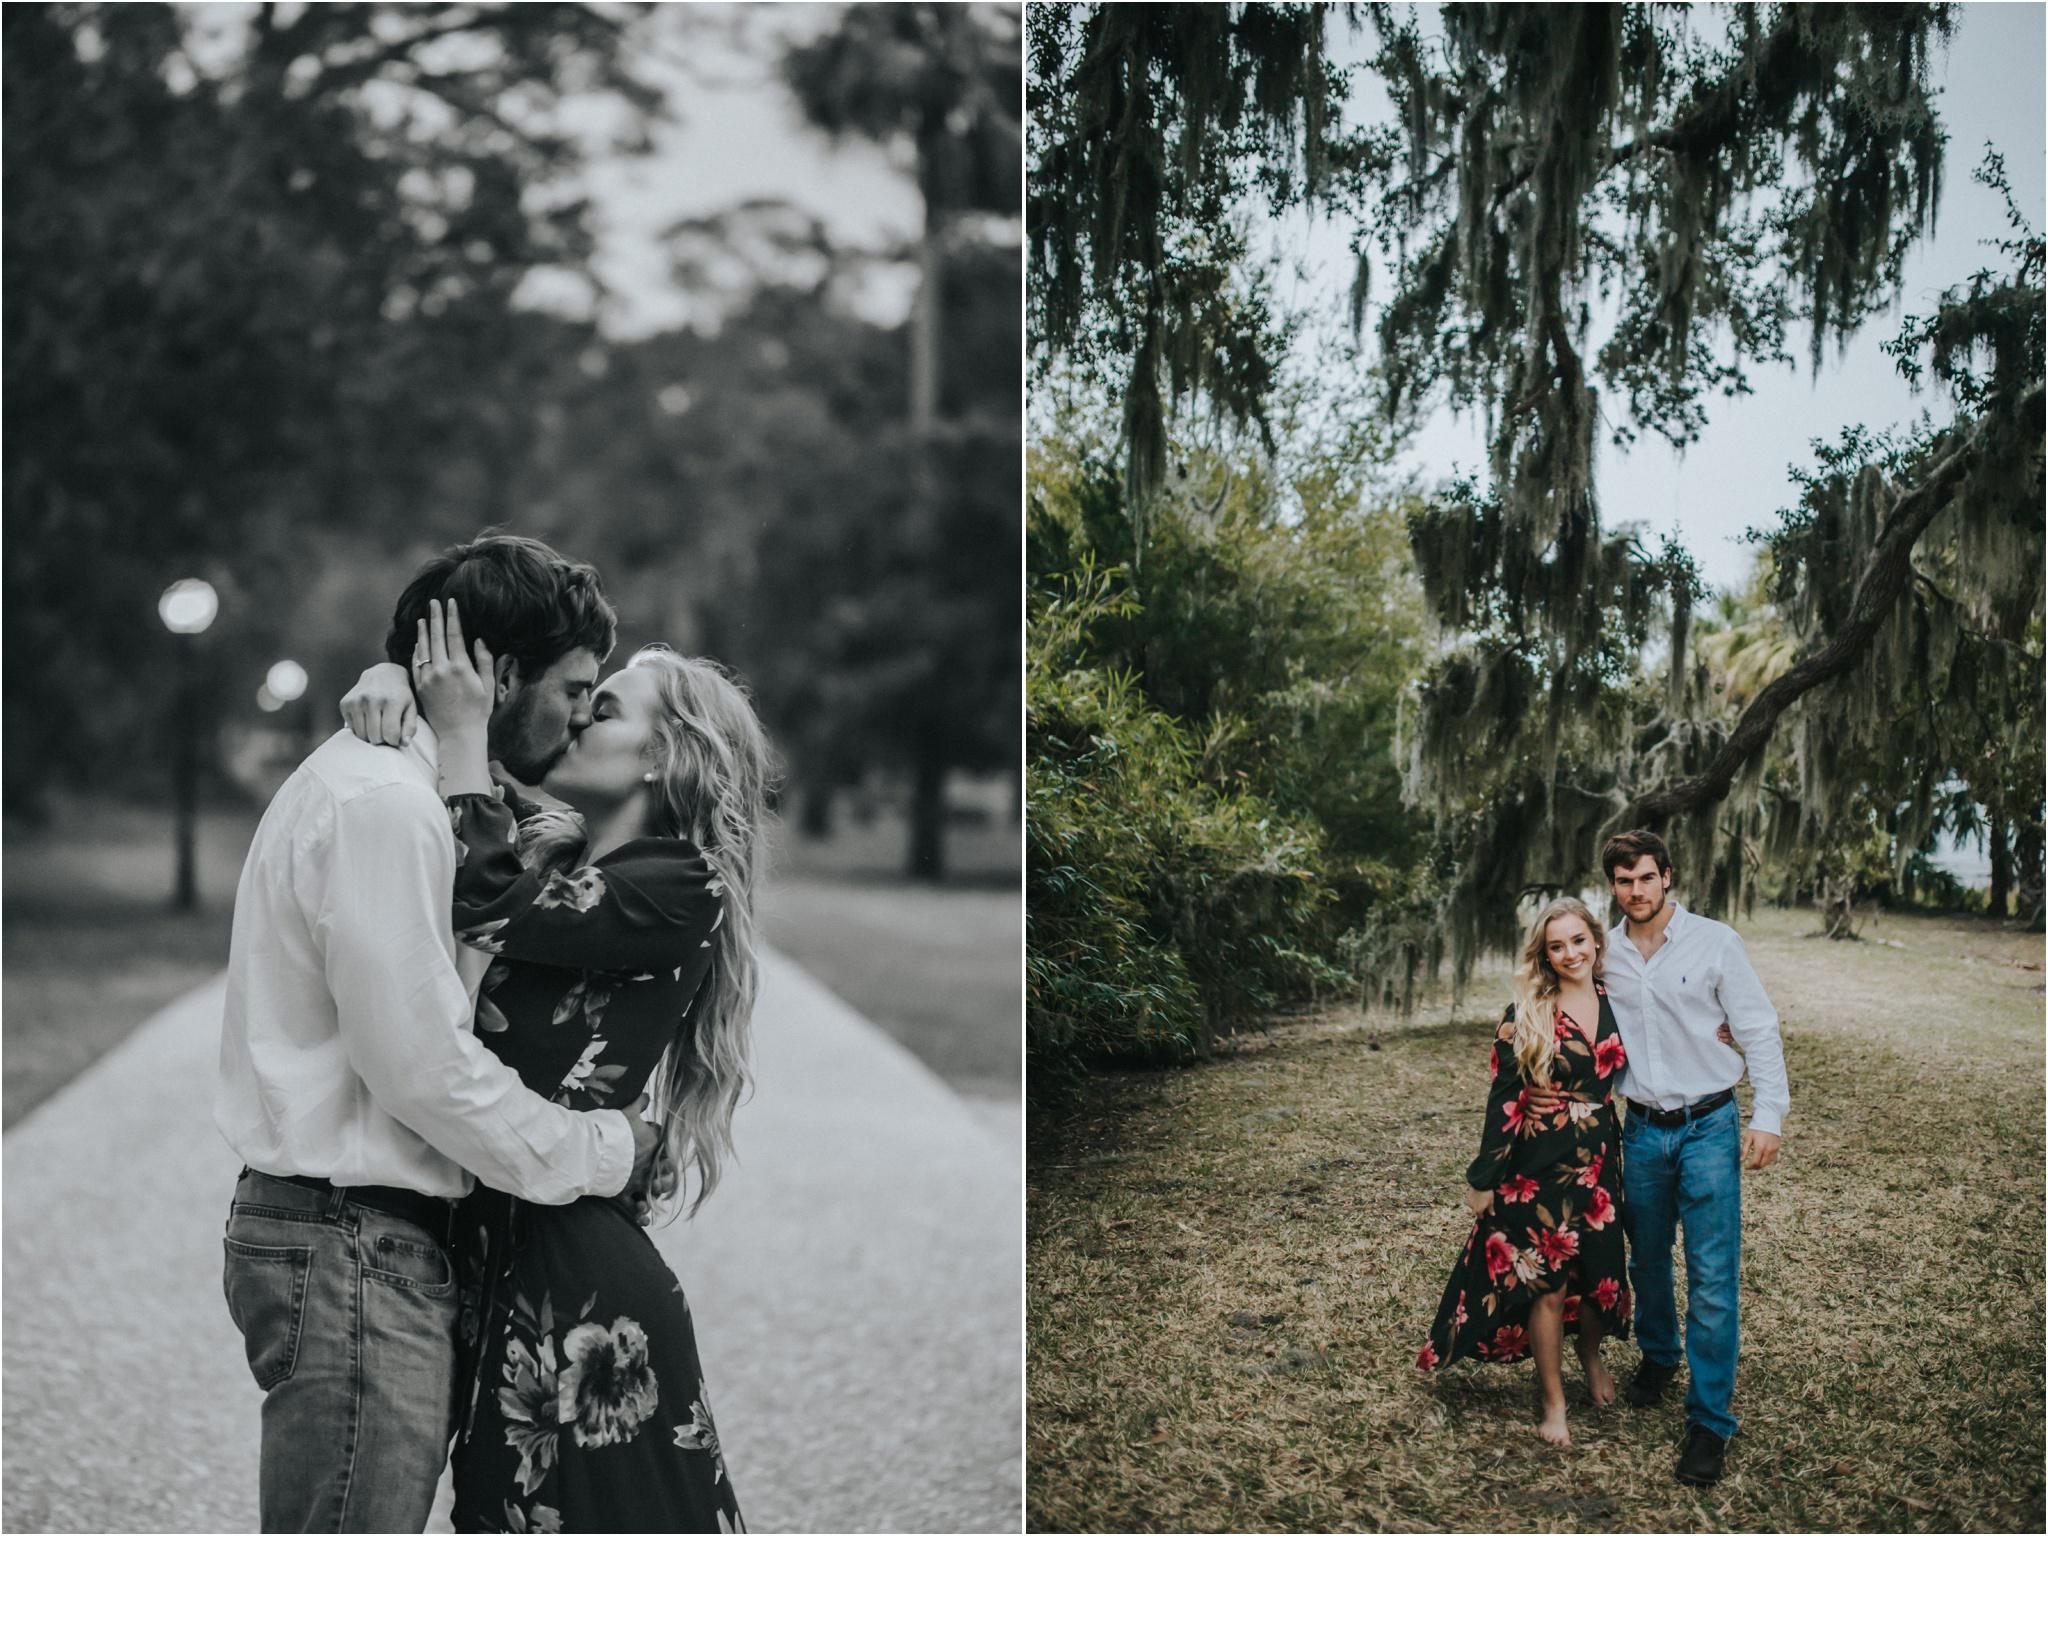 Rainey_Gregg_Photography_St._Simons_Island_Georgia_California_Wedding_Portrait_Photography_0701.jpg